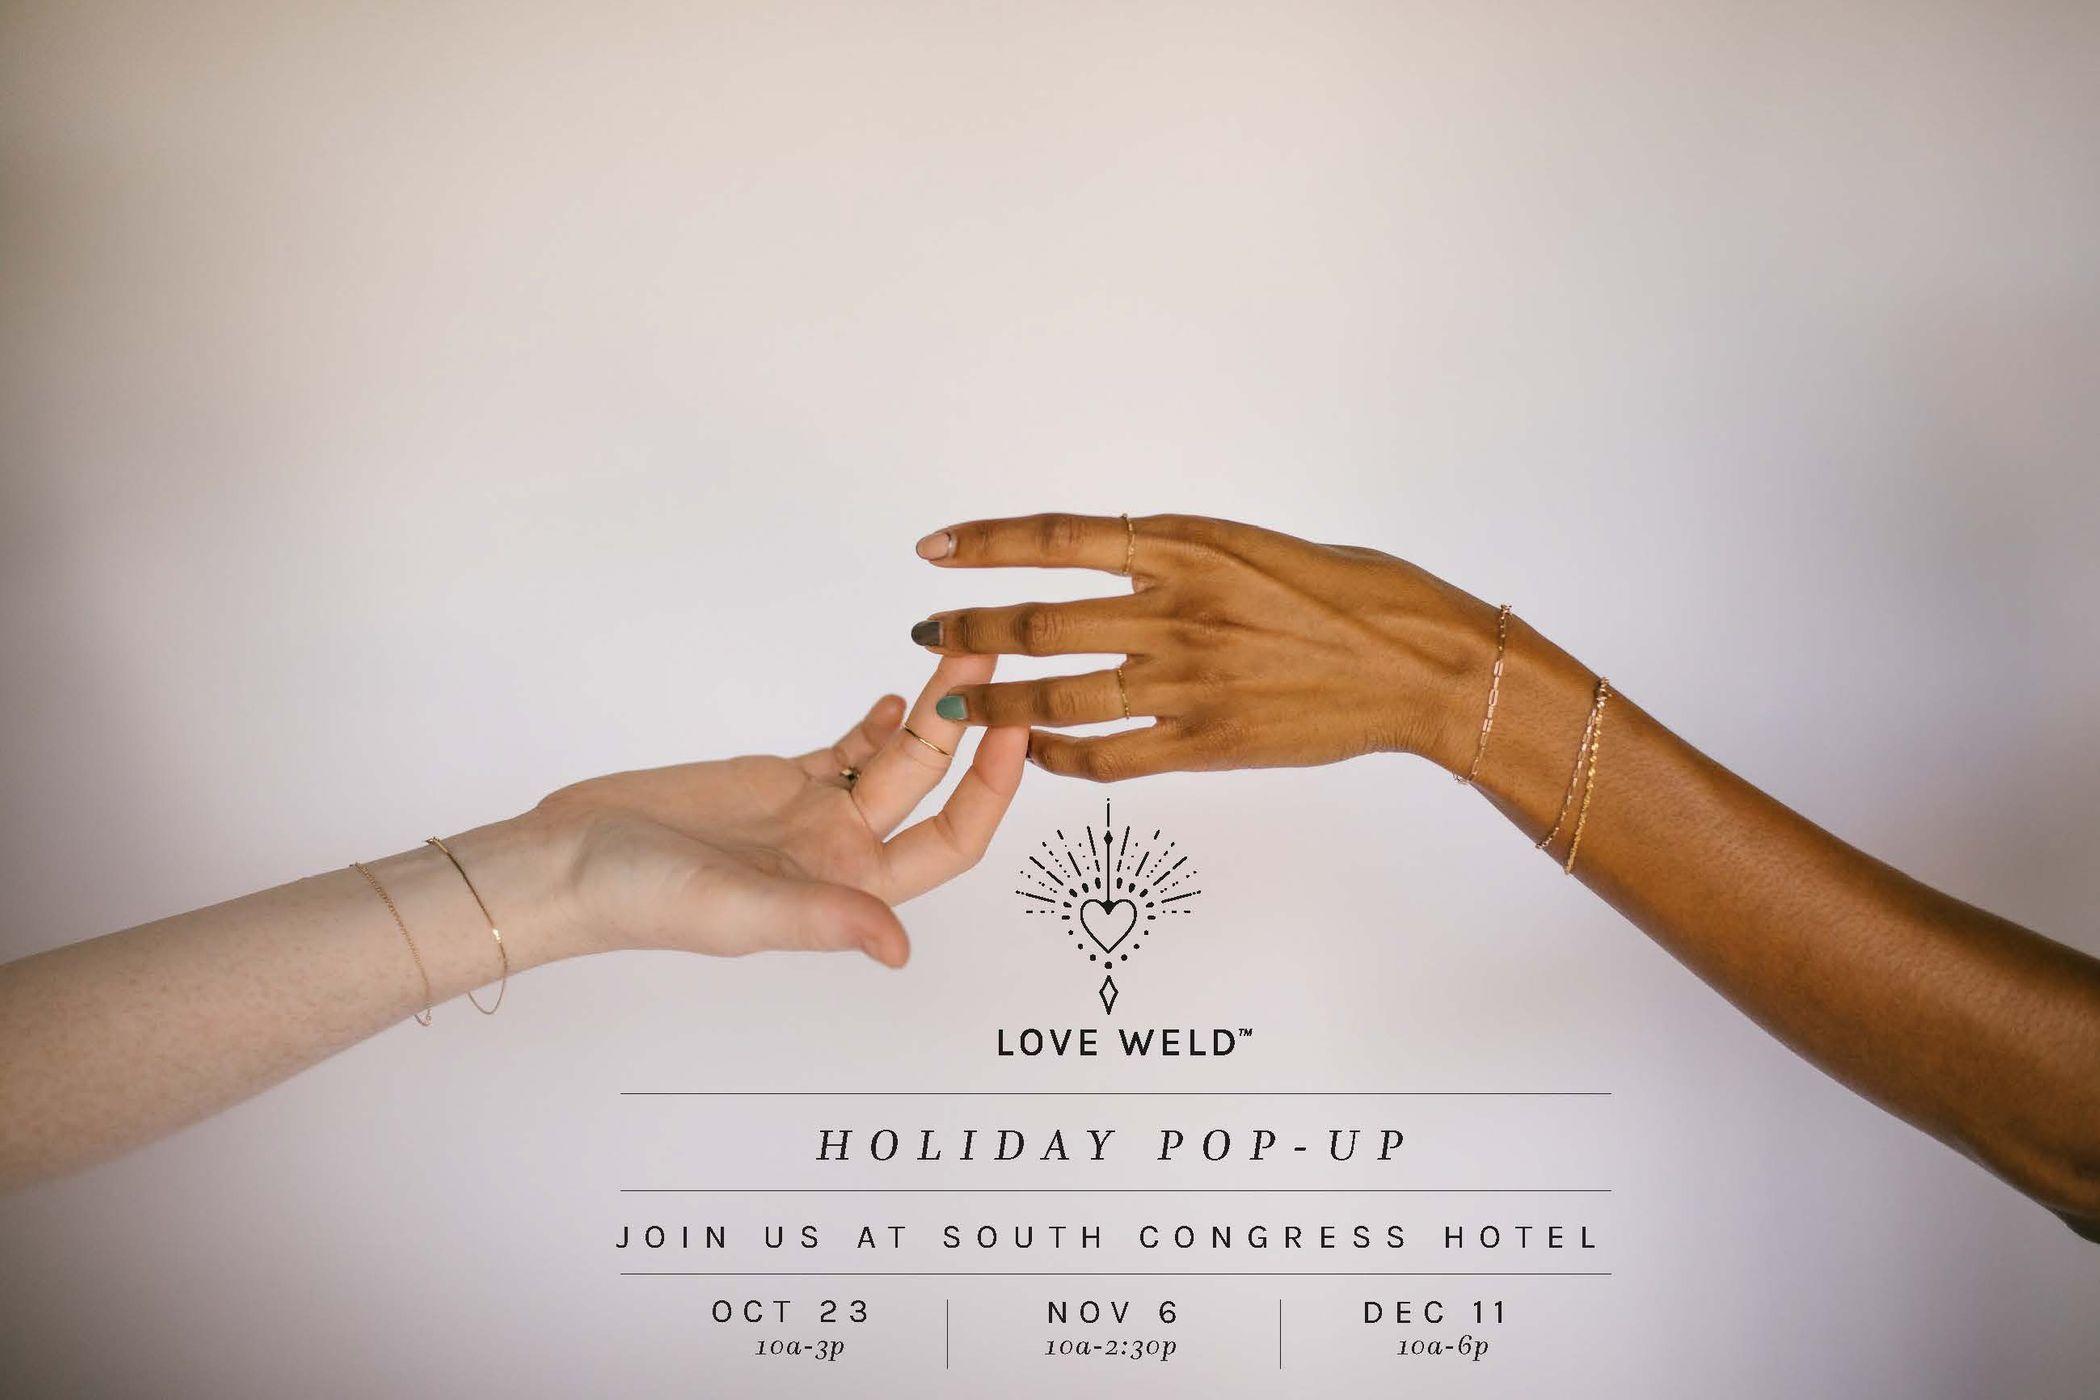 Love Weld Pop Ups at South Congress Hotel